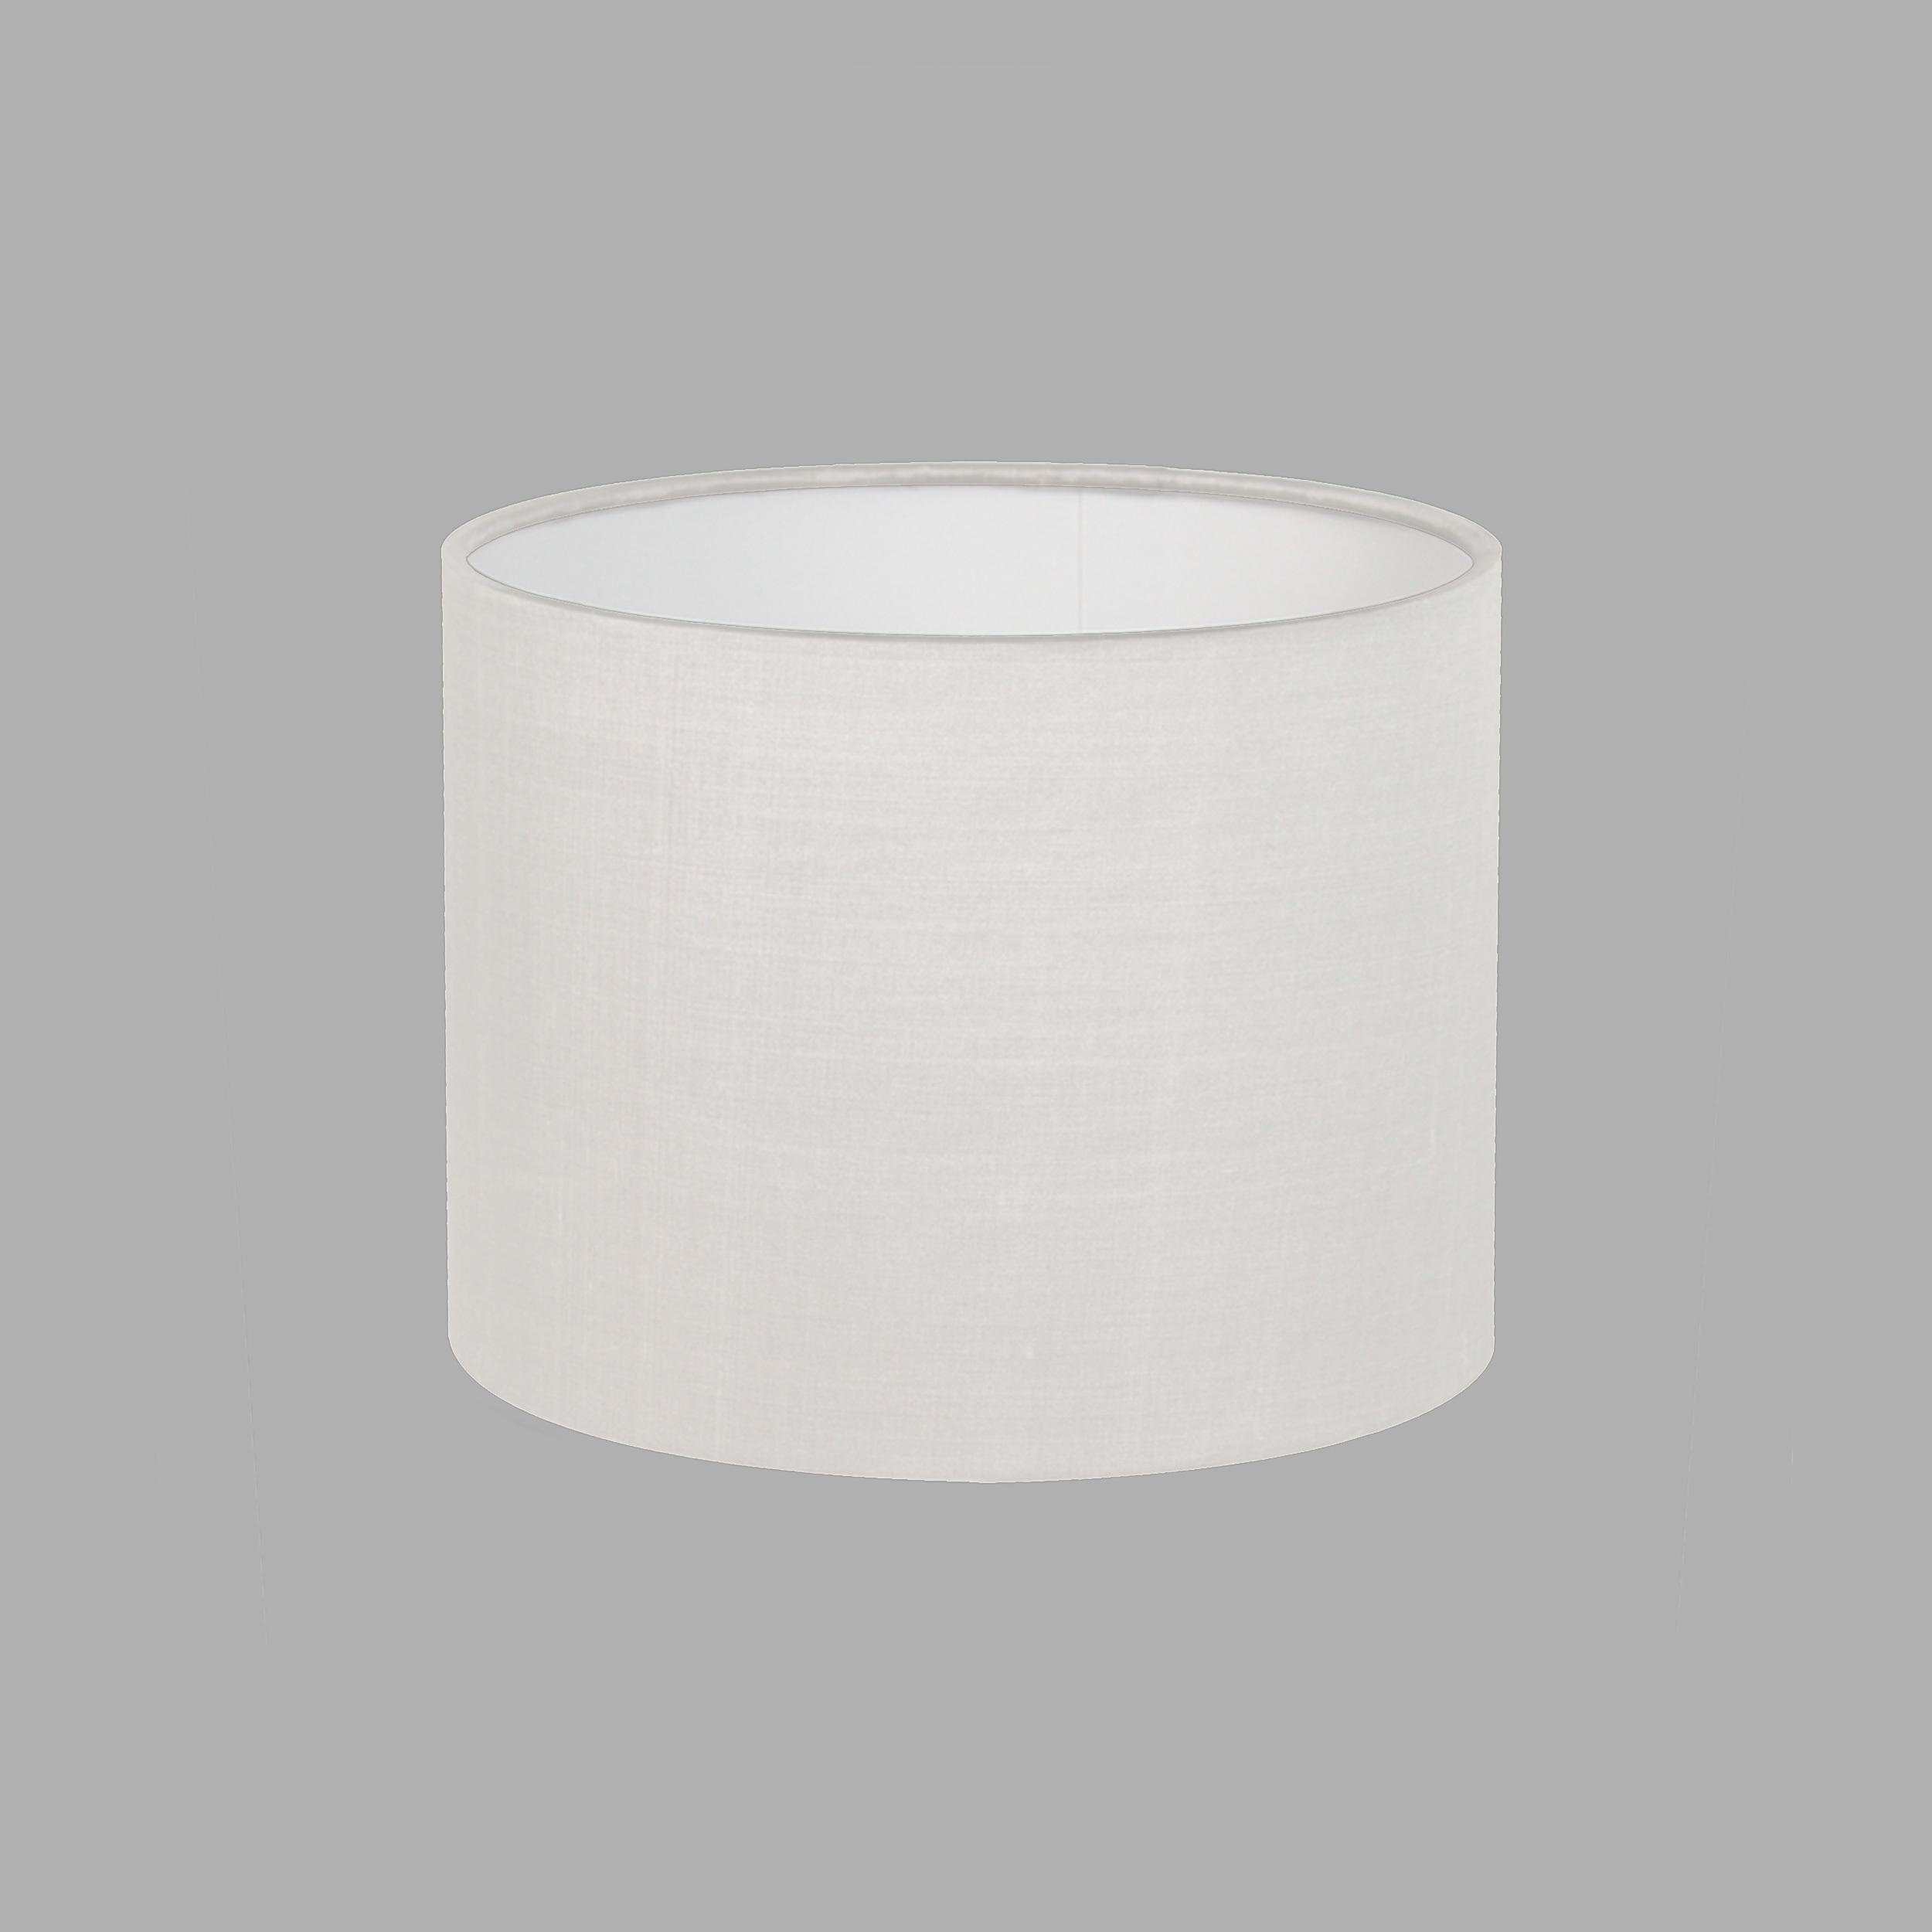 Абажур Astro Drum 5016001 (4061), белый, текстиль - фото 1